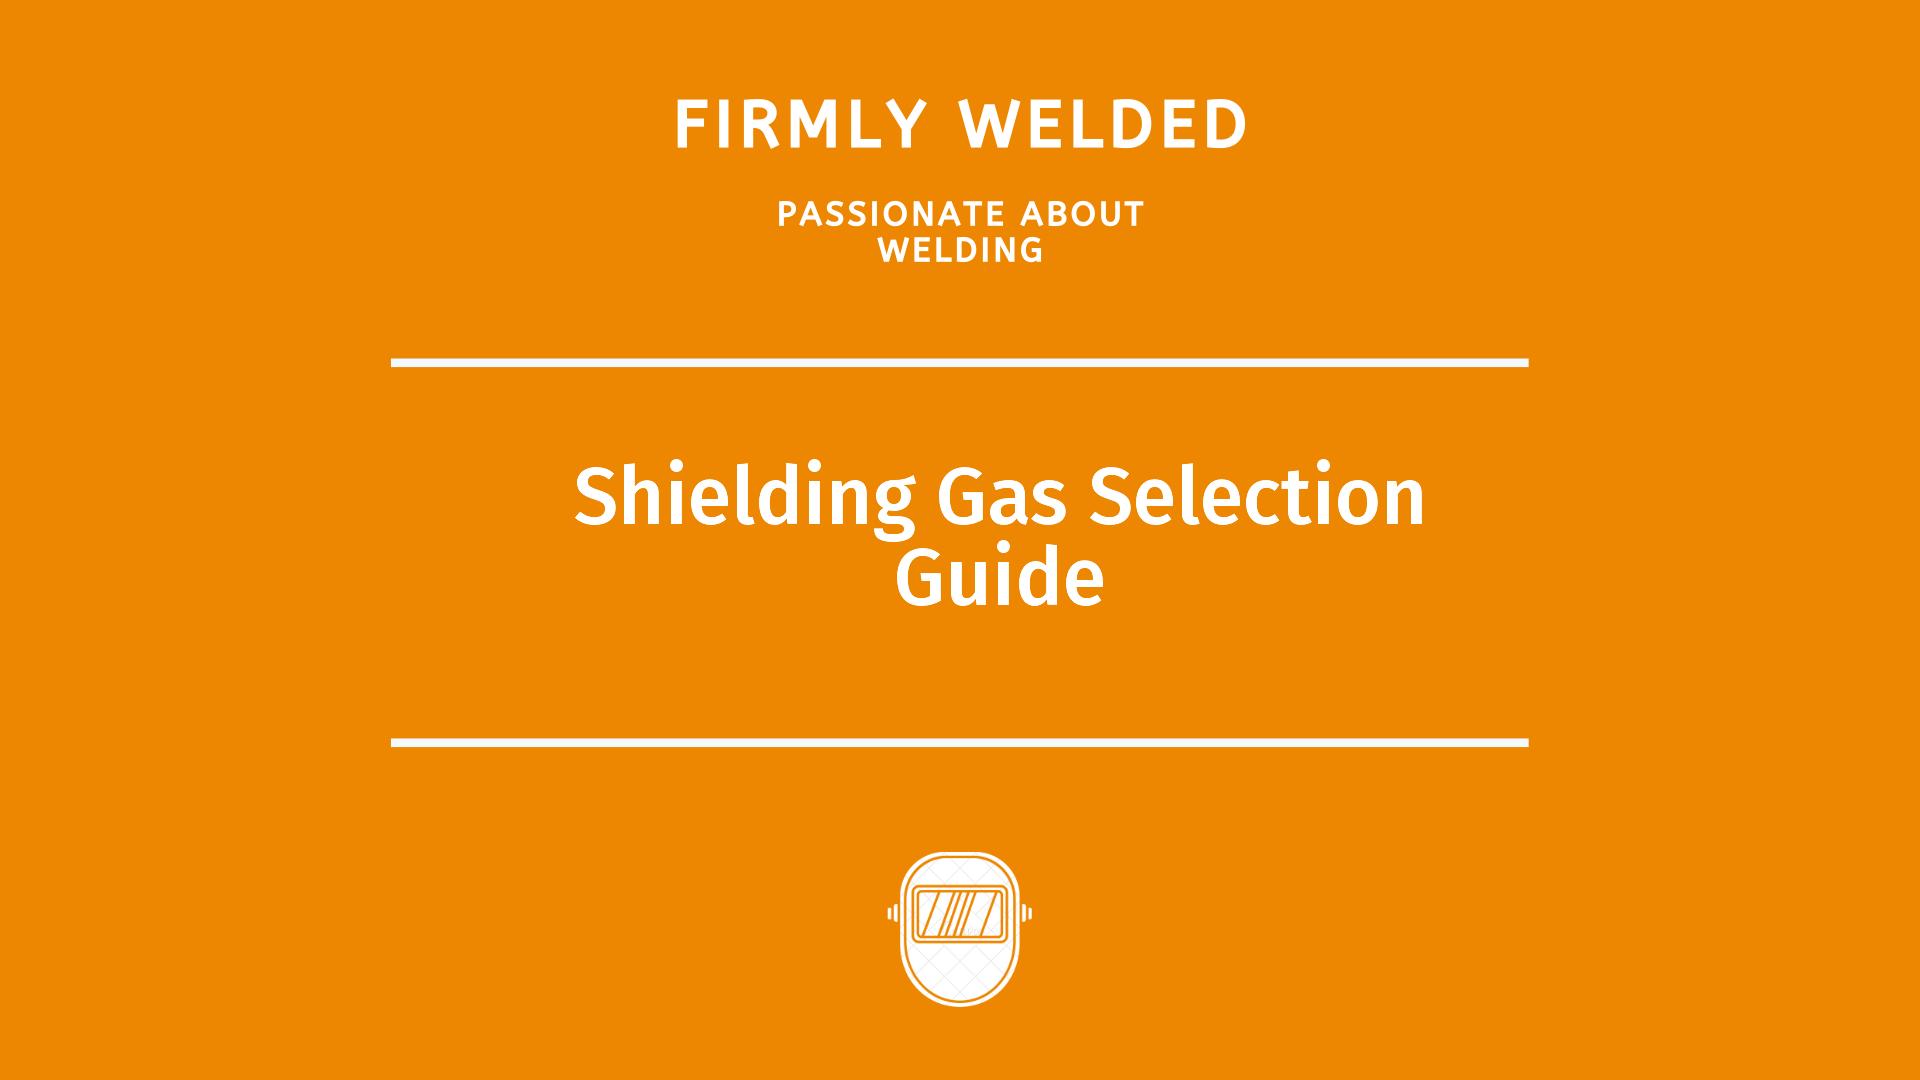 Shielding Gas Selection Guide